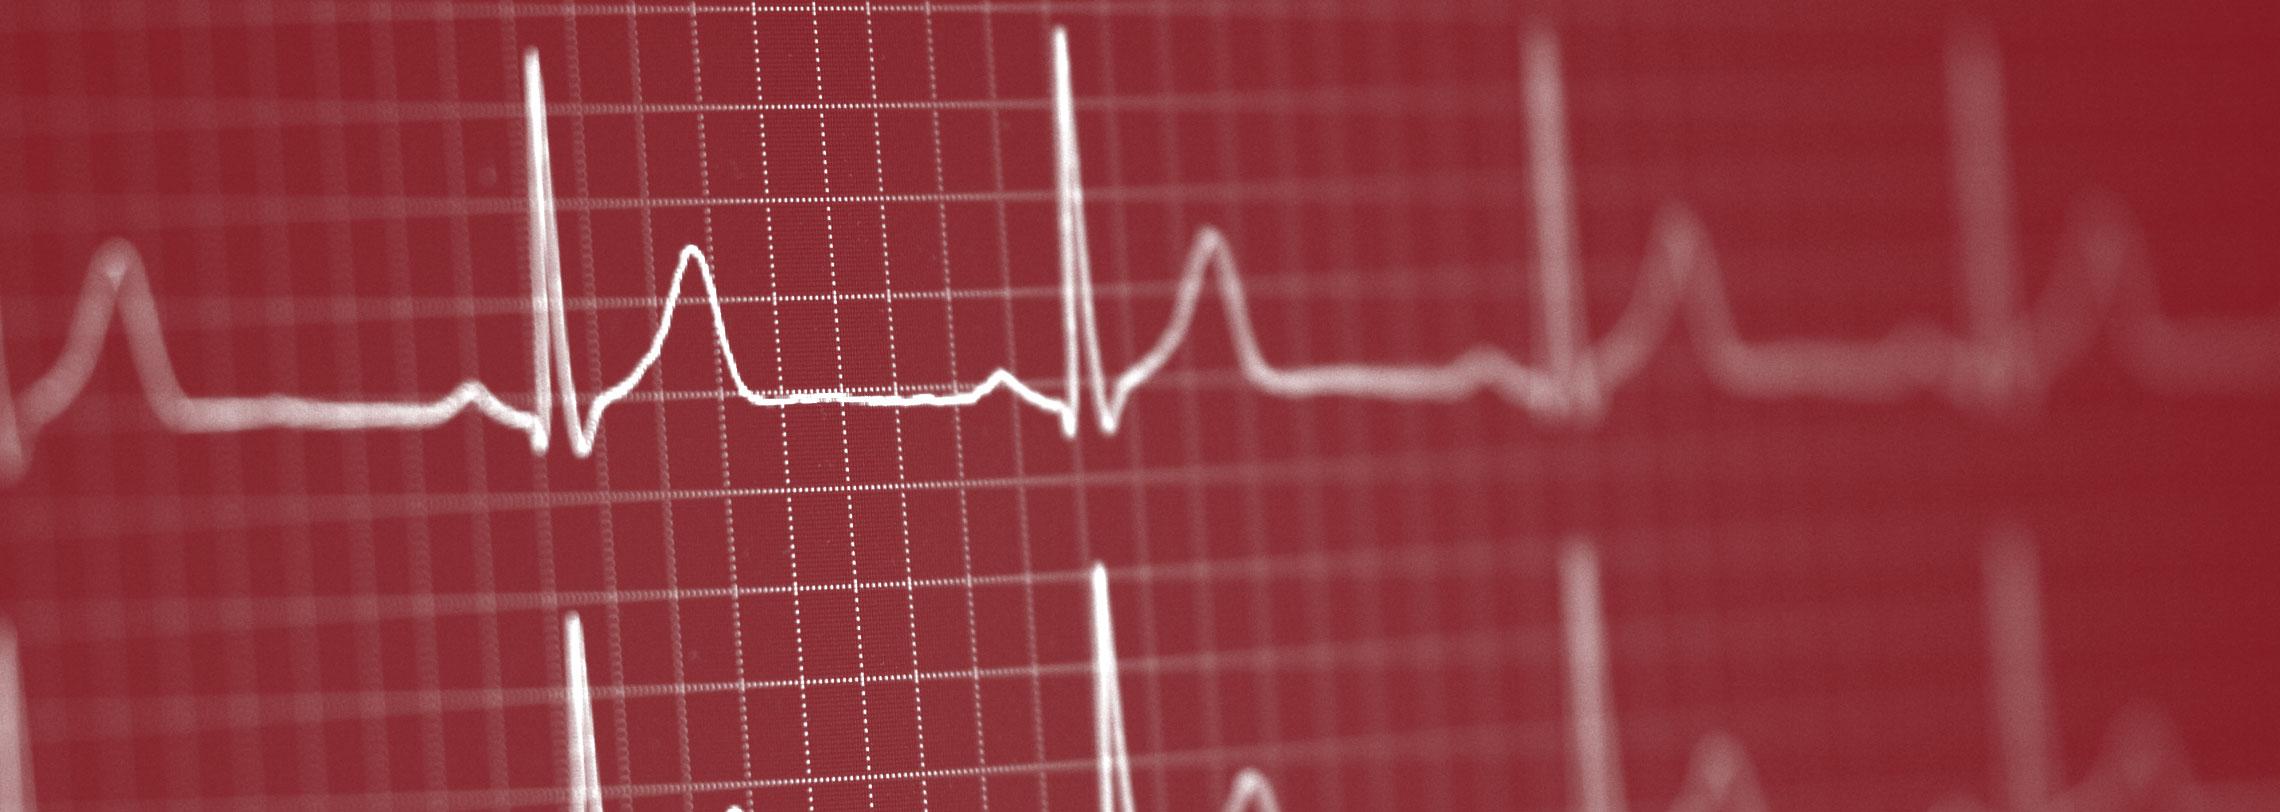 EKG- Kardiologe Berlin Schlachtensee